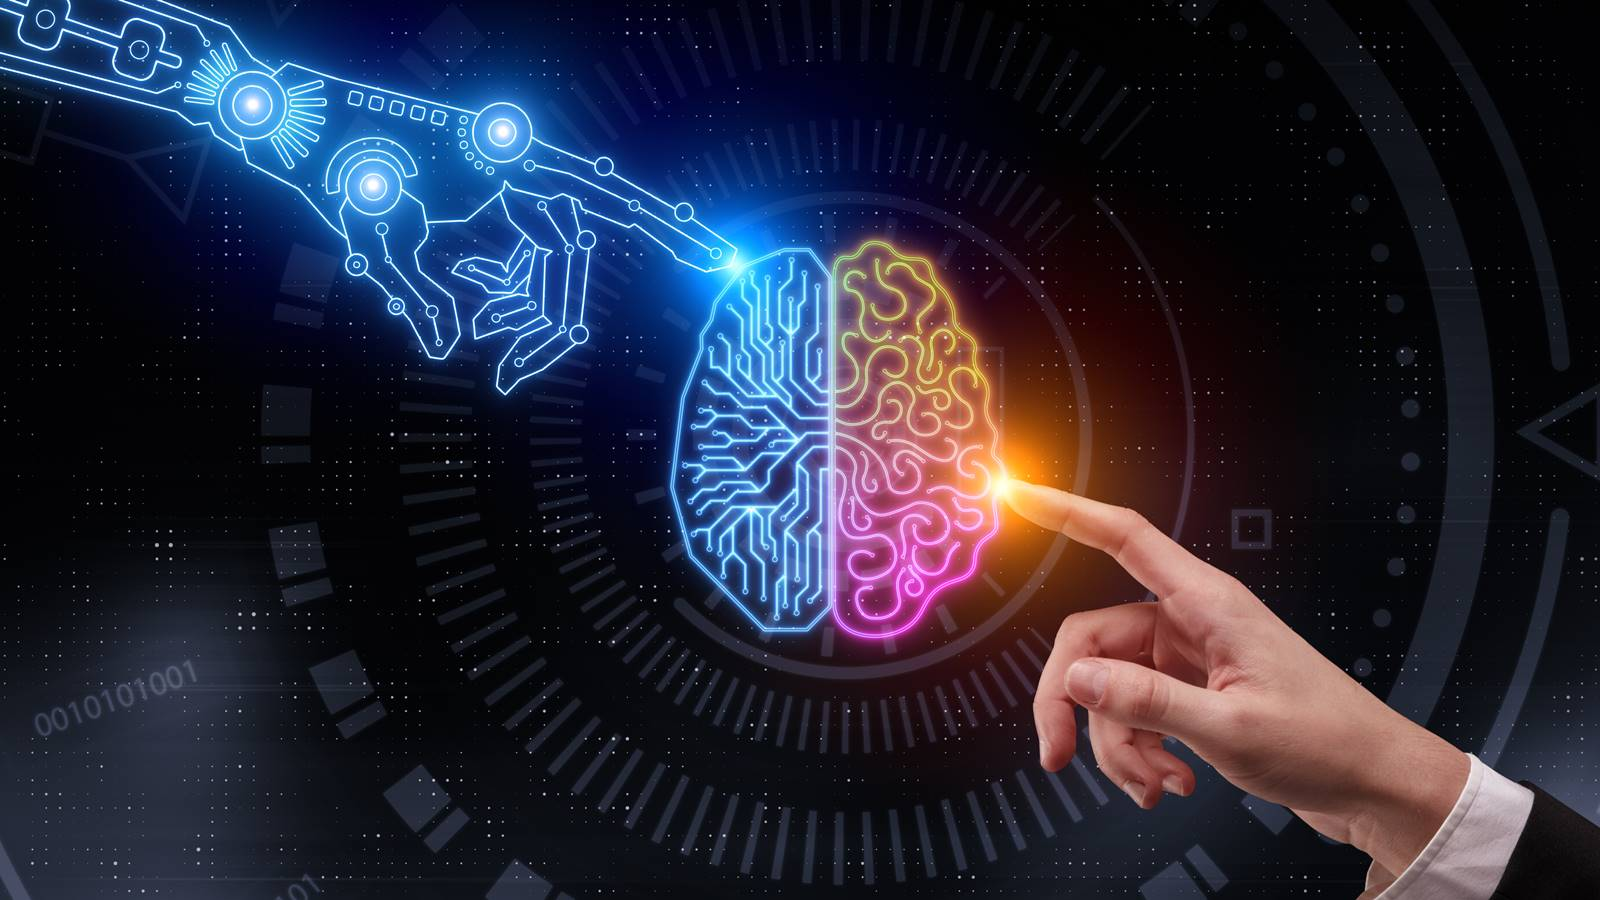 mesterséges intelligencia